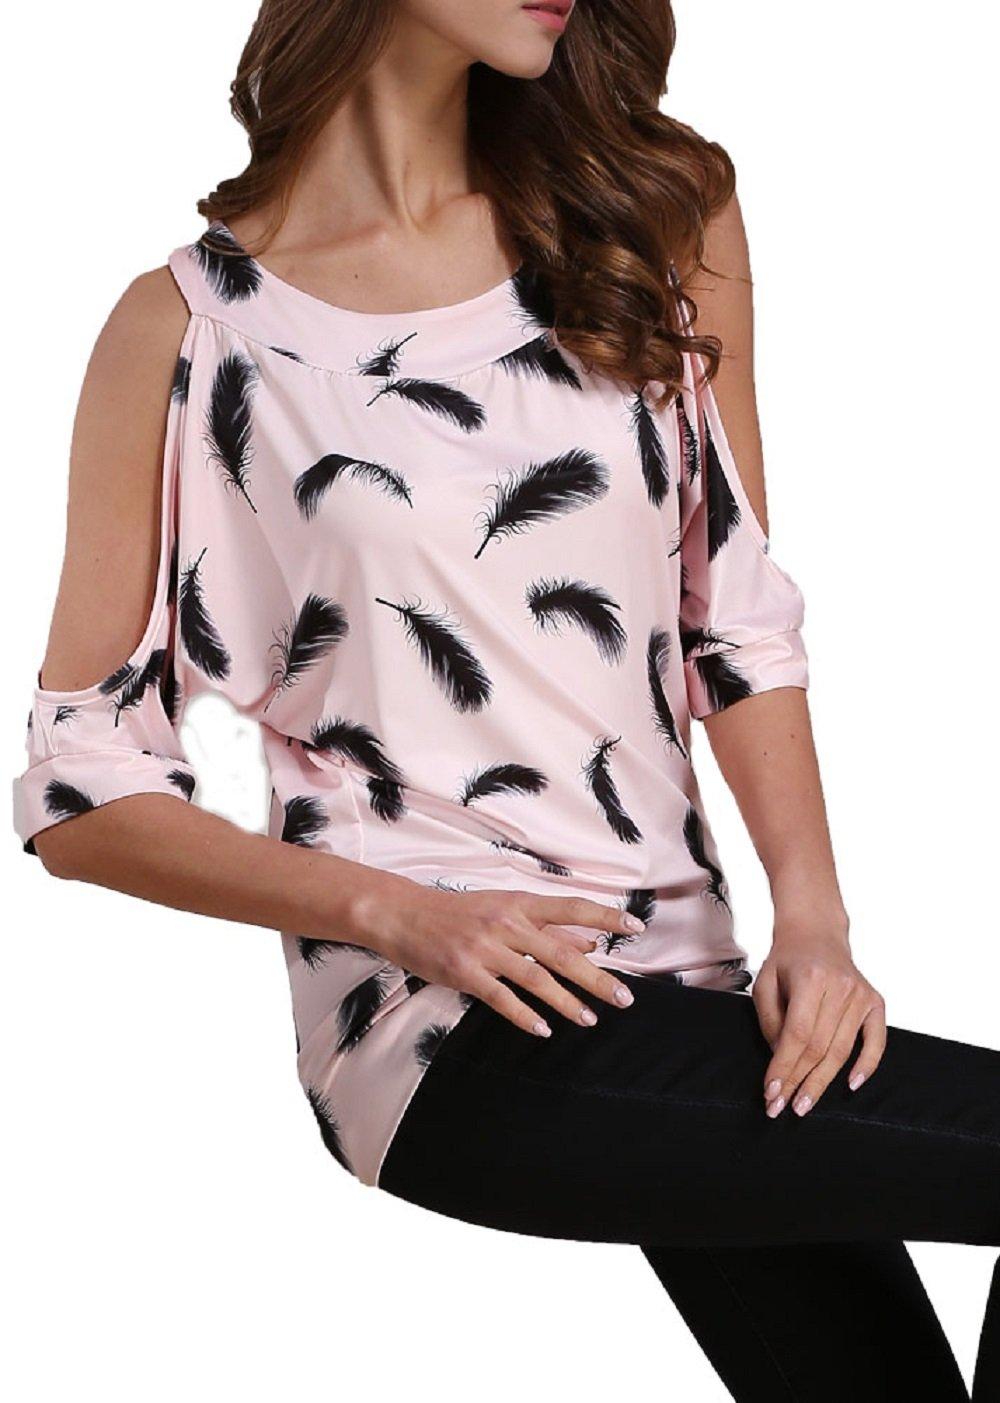 Jusfitsu Women Summer Feather Printed Off Shoulder Short Sleeve Top T-shirt Blouse Pink XL